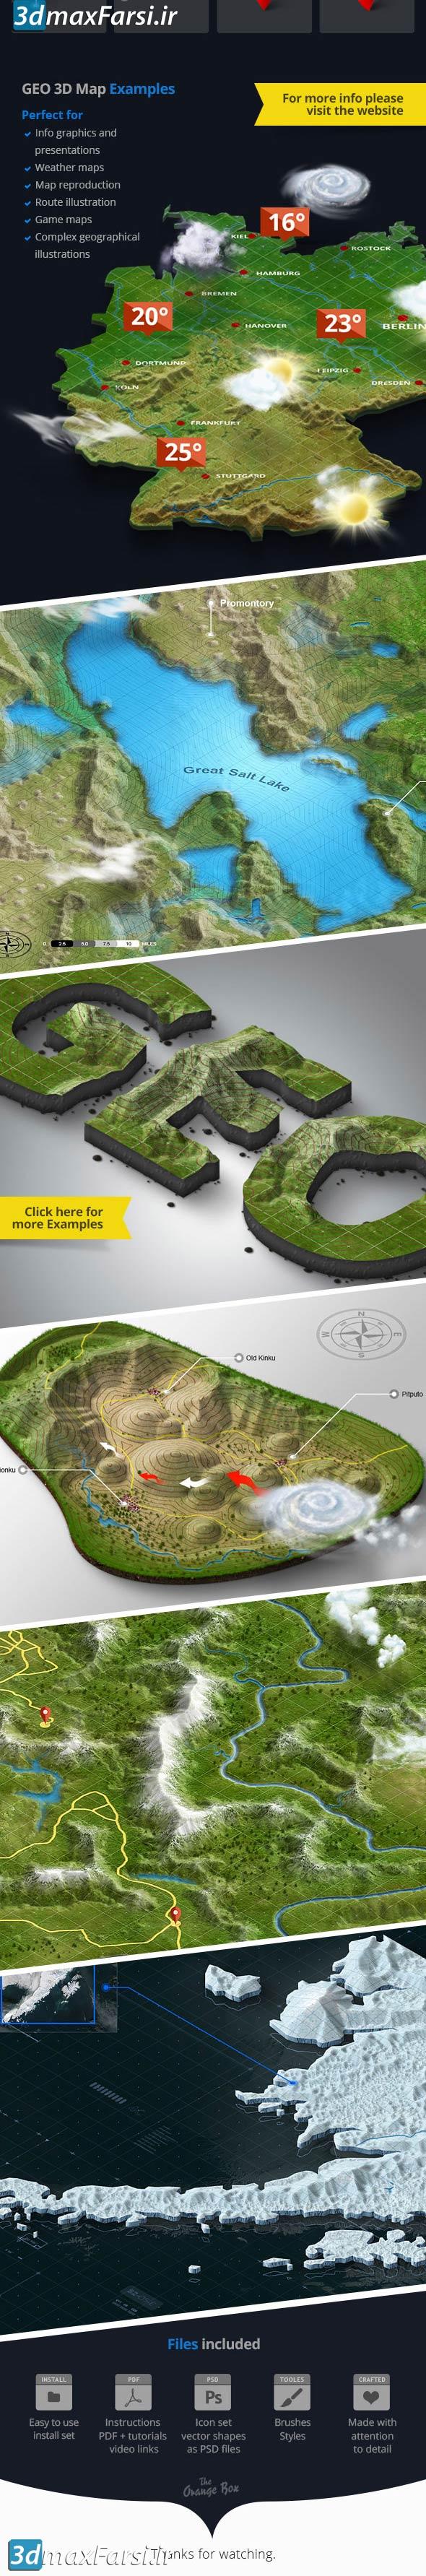 پلاگین فتوشاپ نقشهساز سهبعدی 3D Map Generator GEO